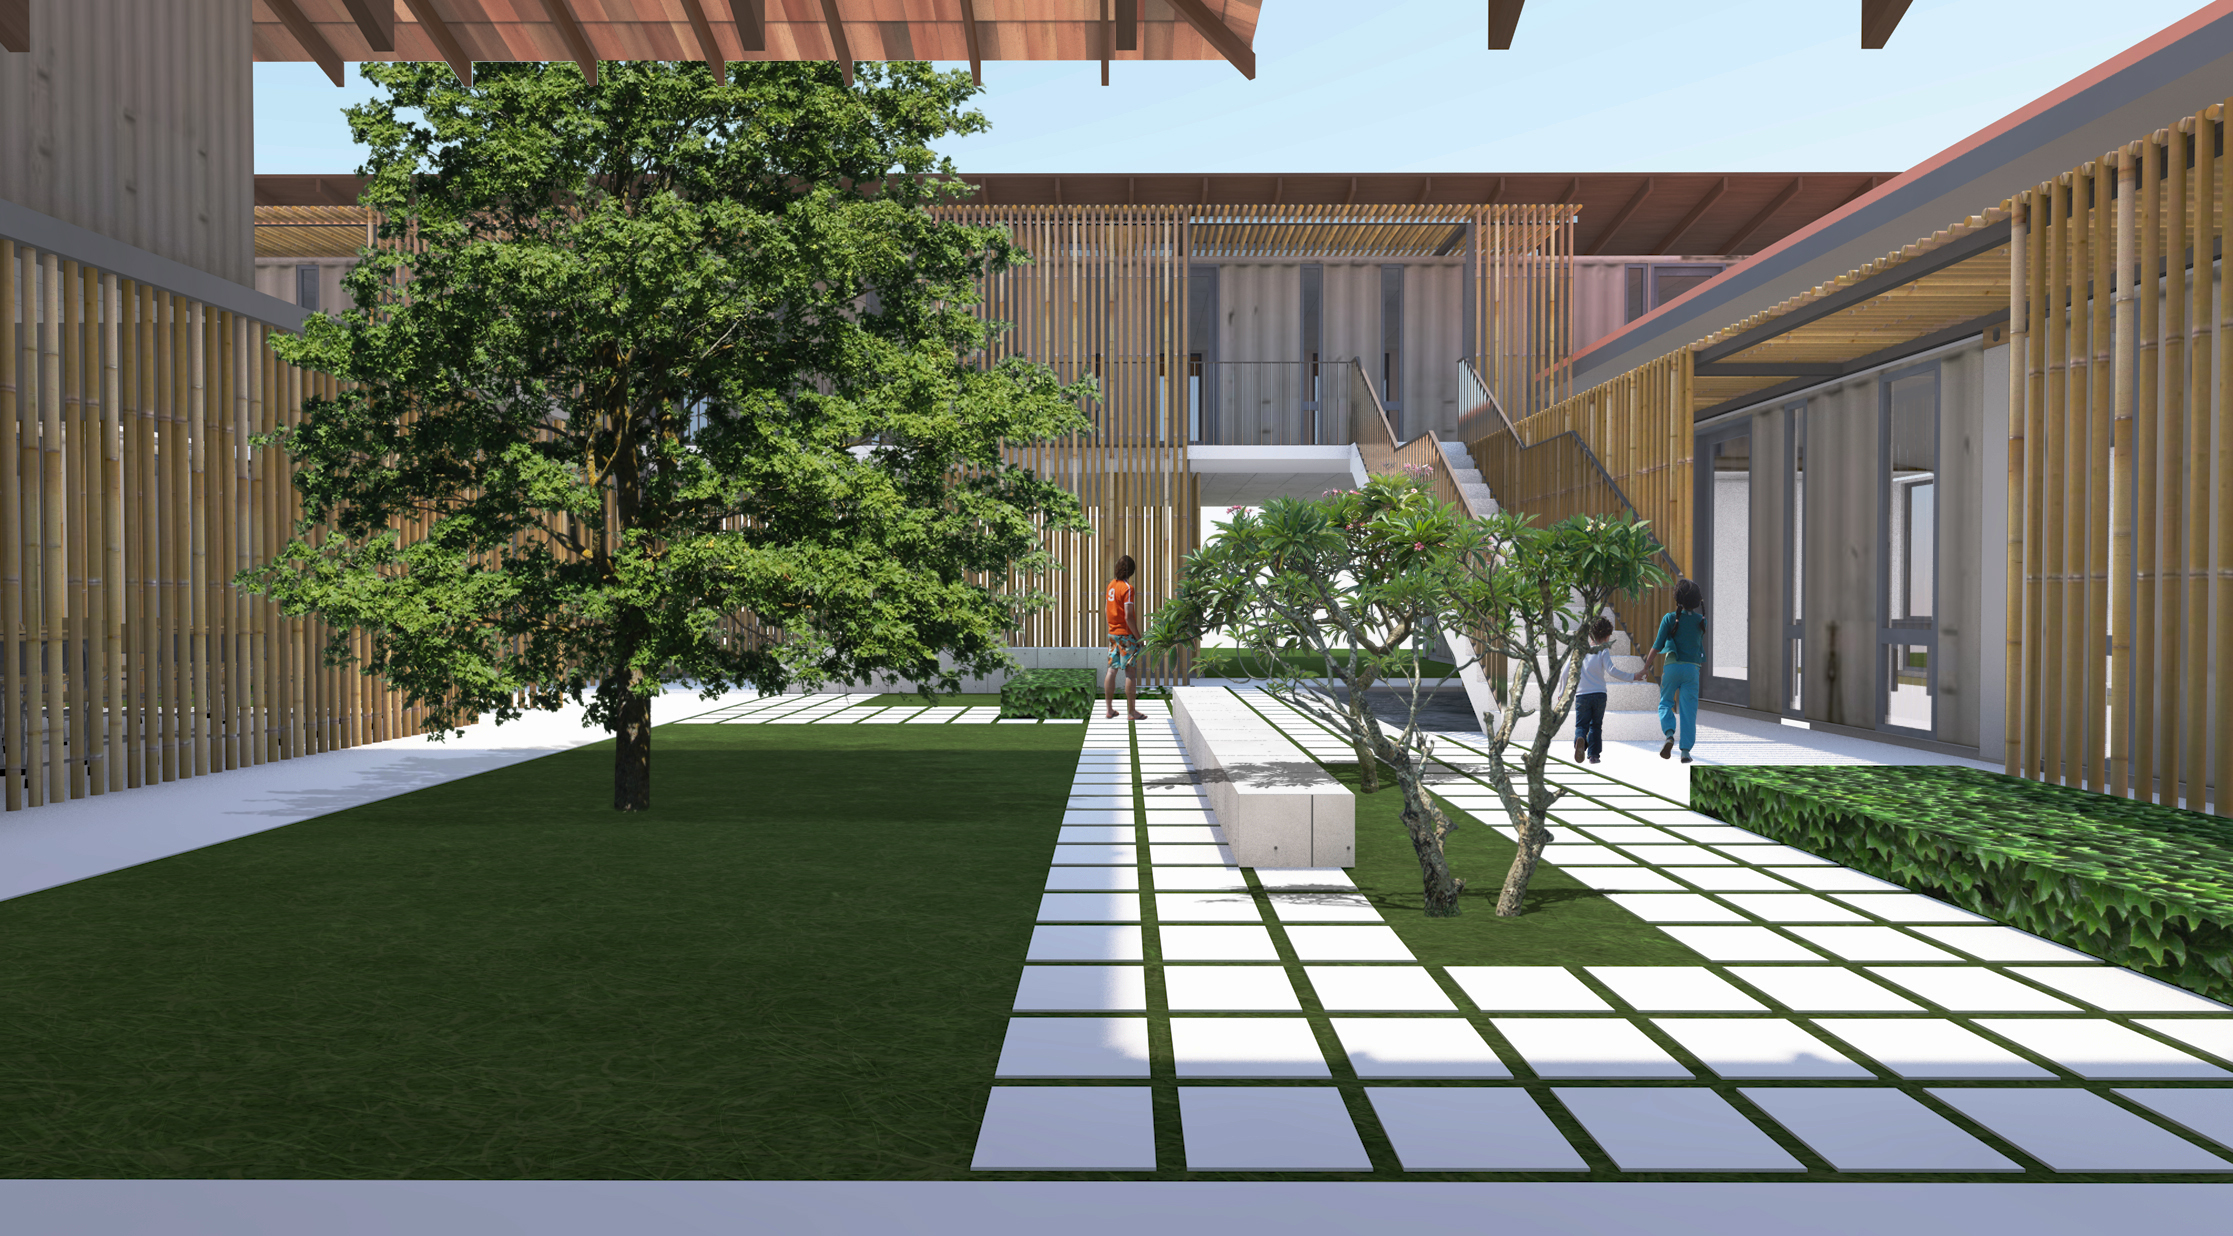 CAREHAVEN ORPHANAGE JOHOR MALAYSIA Philanthropy With Ideal City Design Group And Marlborough College Malaysia